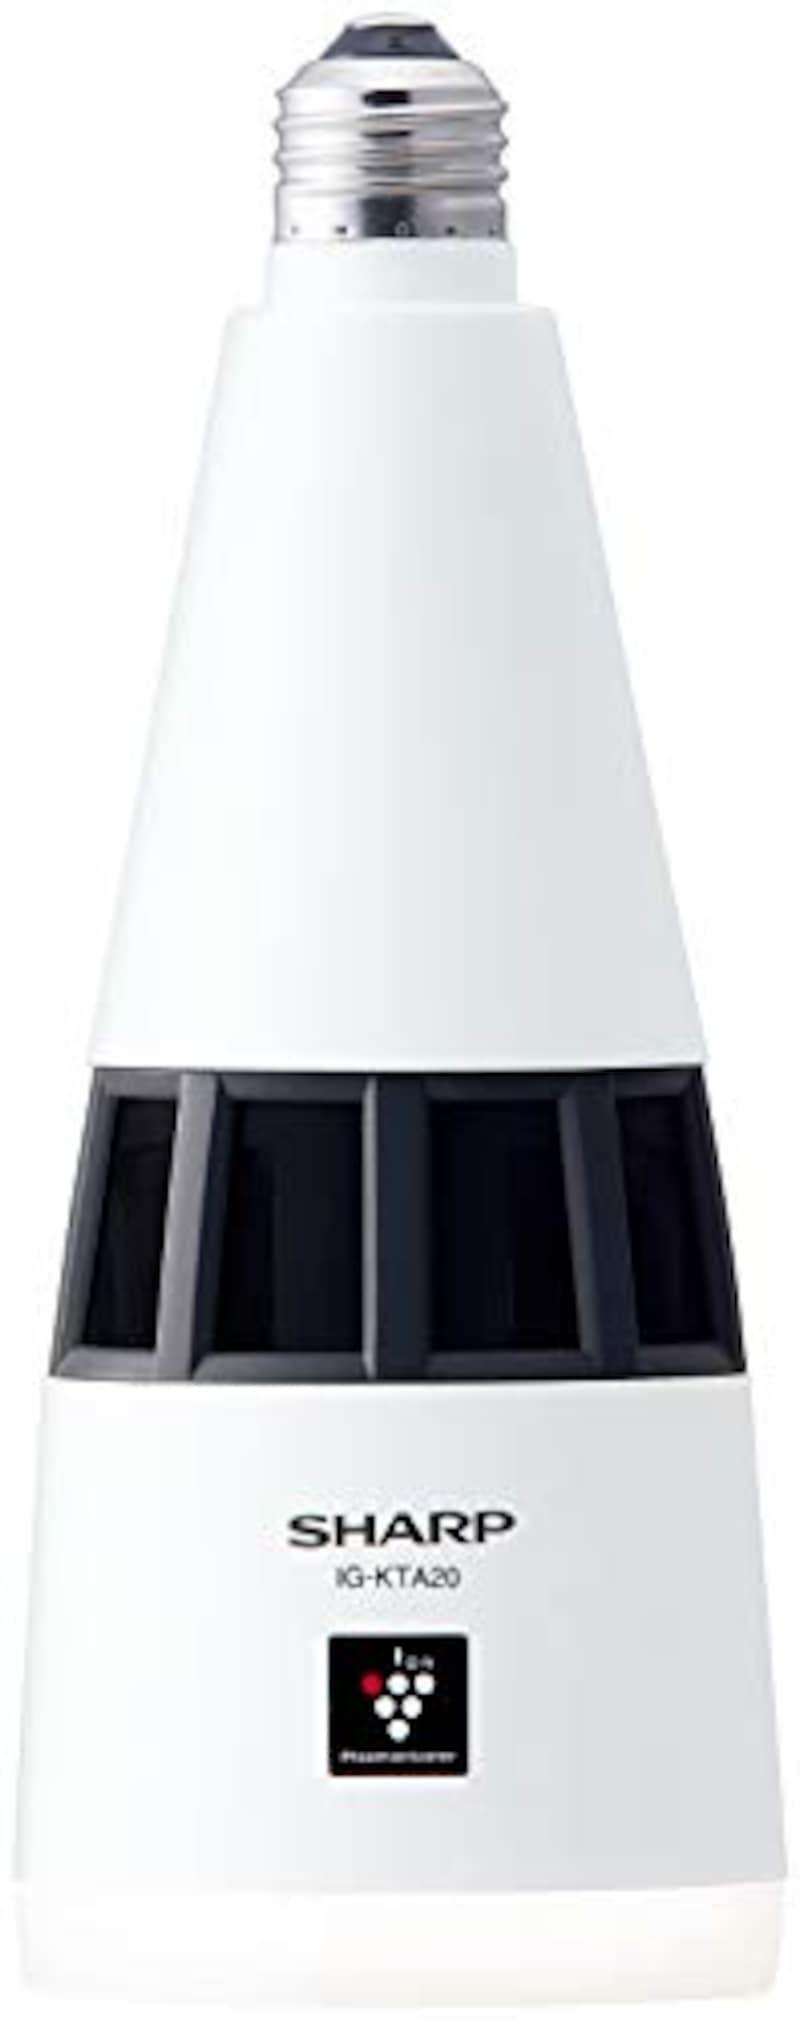 SHARP(シャープ),天井設置型イオン発生機,IG-KTA20-W